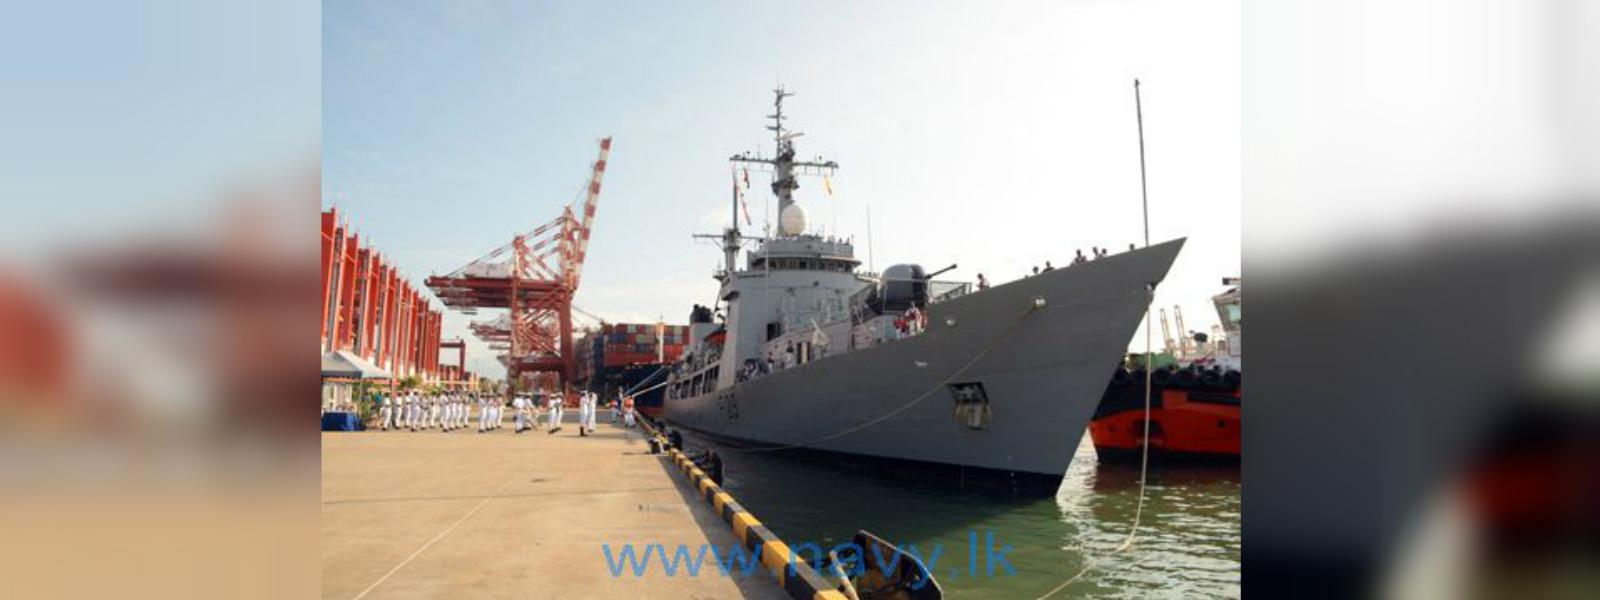 "Bangladesh Navy ship ""Somudra Avijan"" arrives at Port of Colombo"